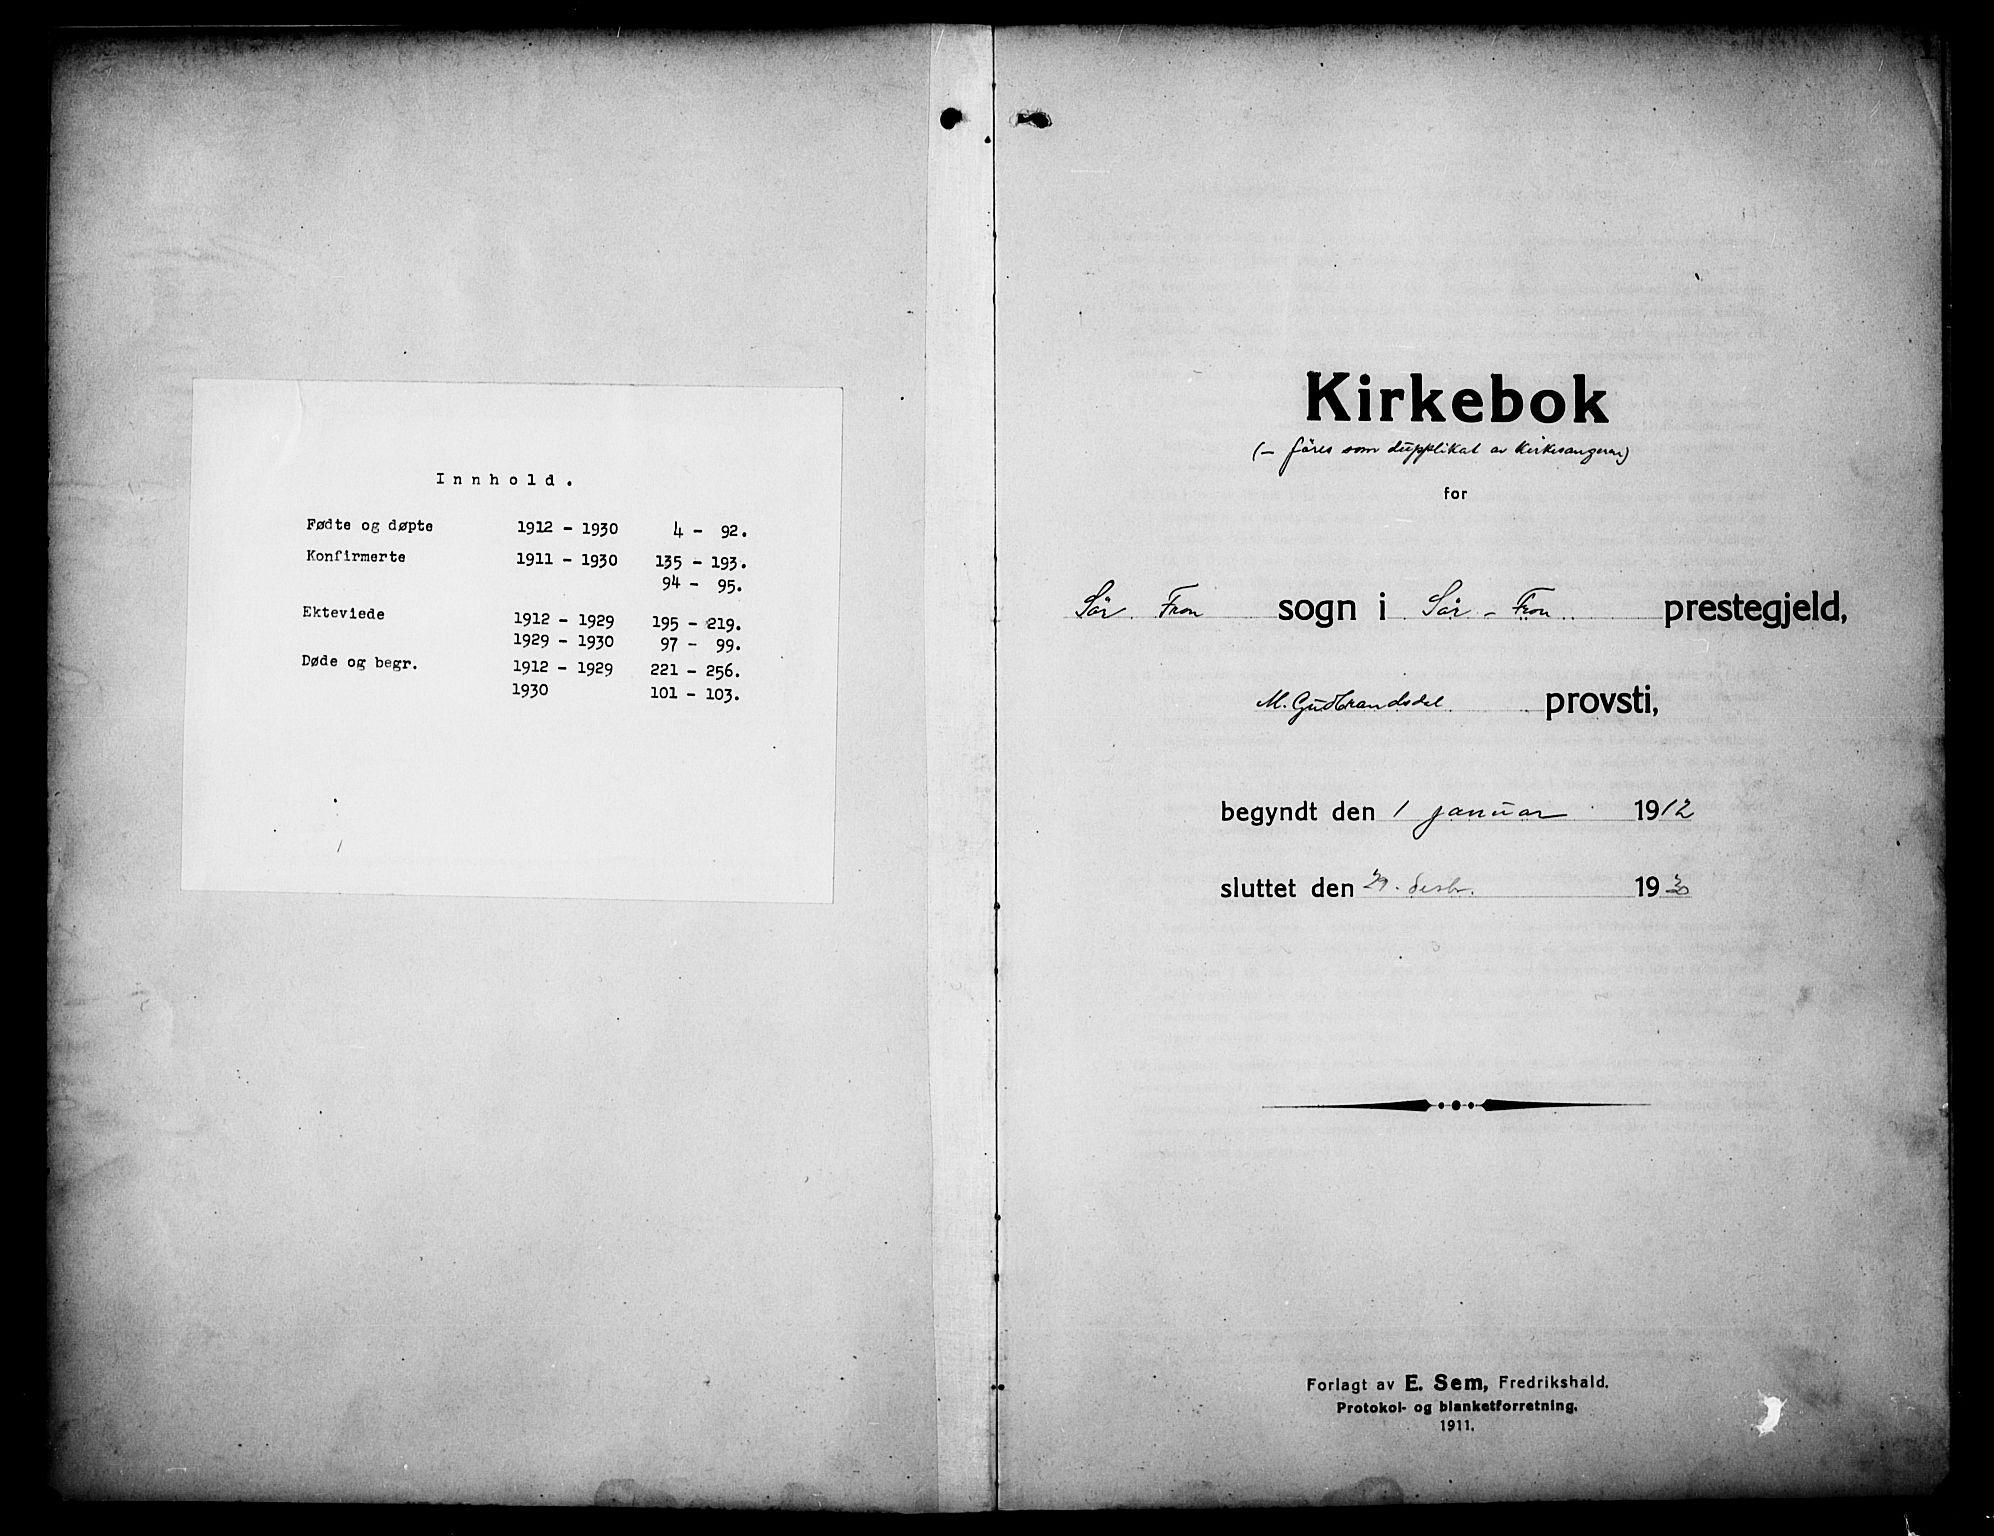 SAH, Sør-Fron prestekontor, H/Ha/Hab/L0005: Klokkerbok nr. 5, 1912-1930, s. 1